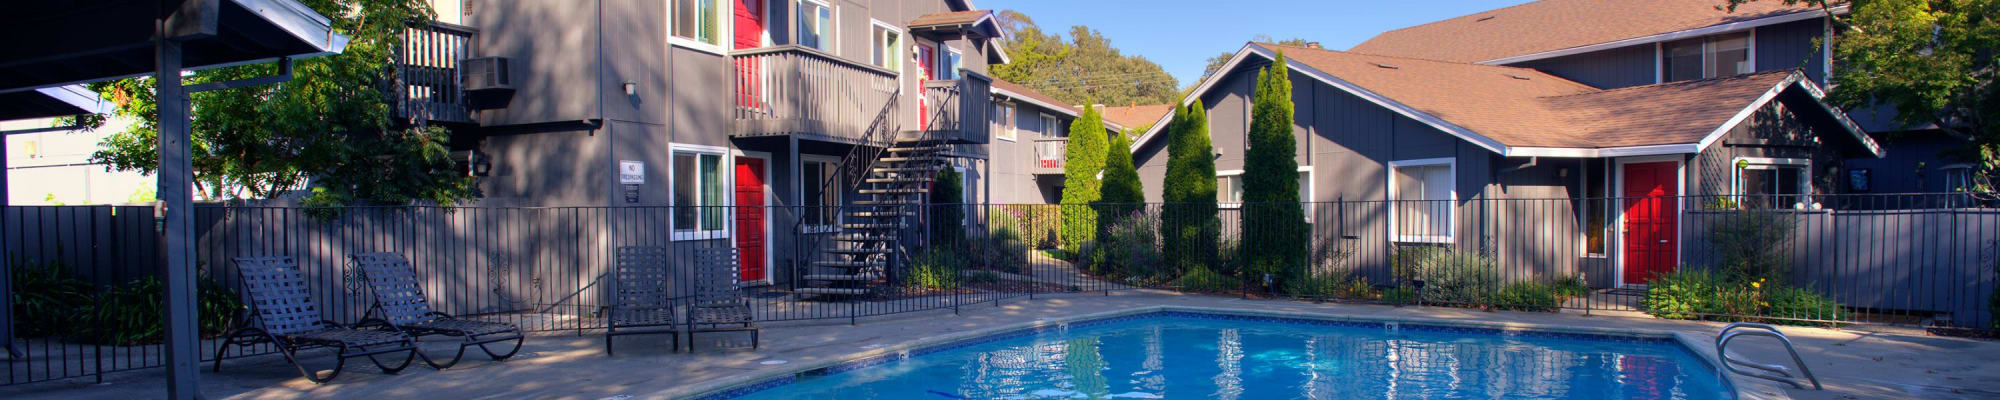 Amenities at Spring Lake Apartment Homes in Santa Rosa, California